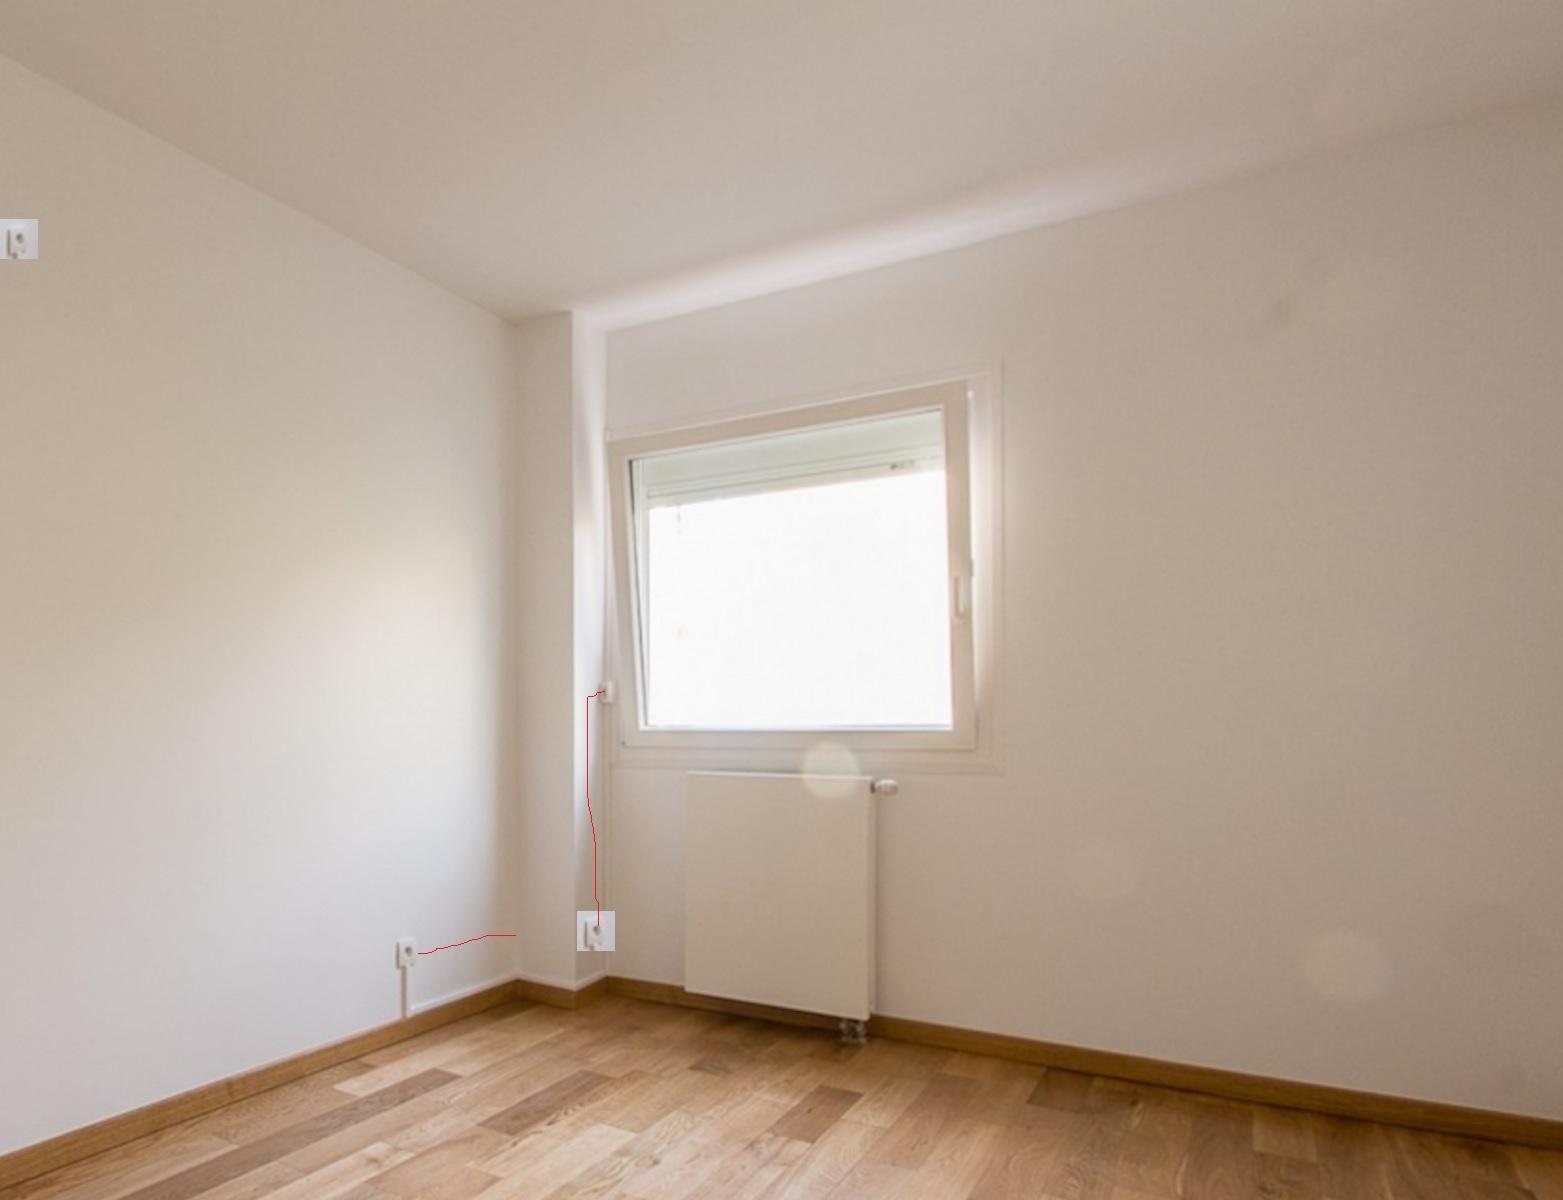 saign e dans placo. Black Bedroom Furniture Sets. Home Design Ideas